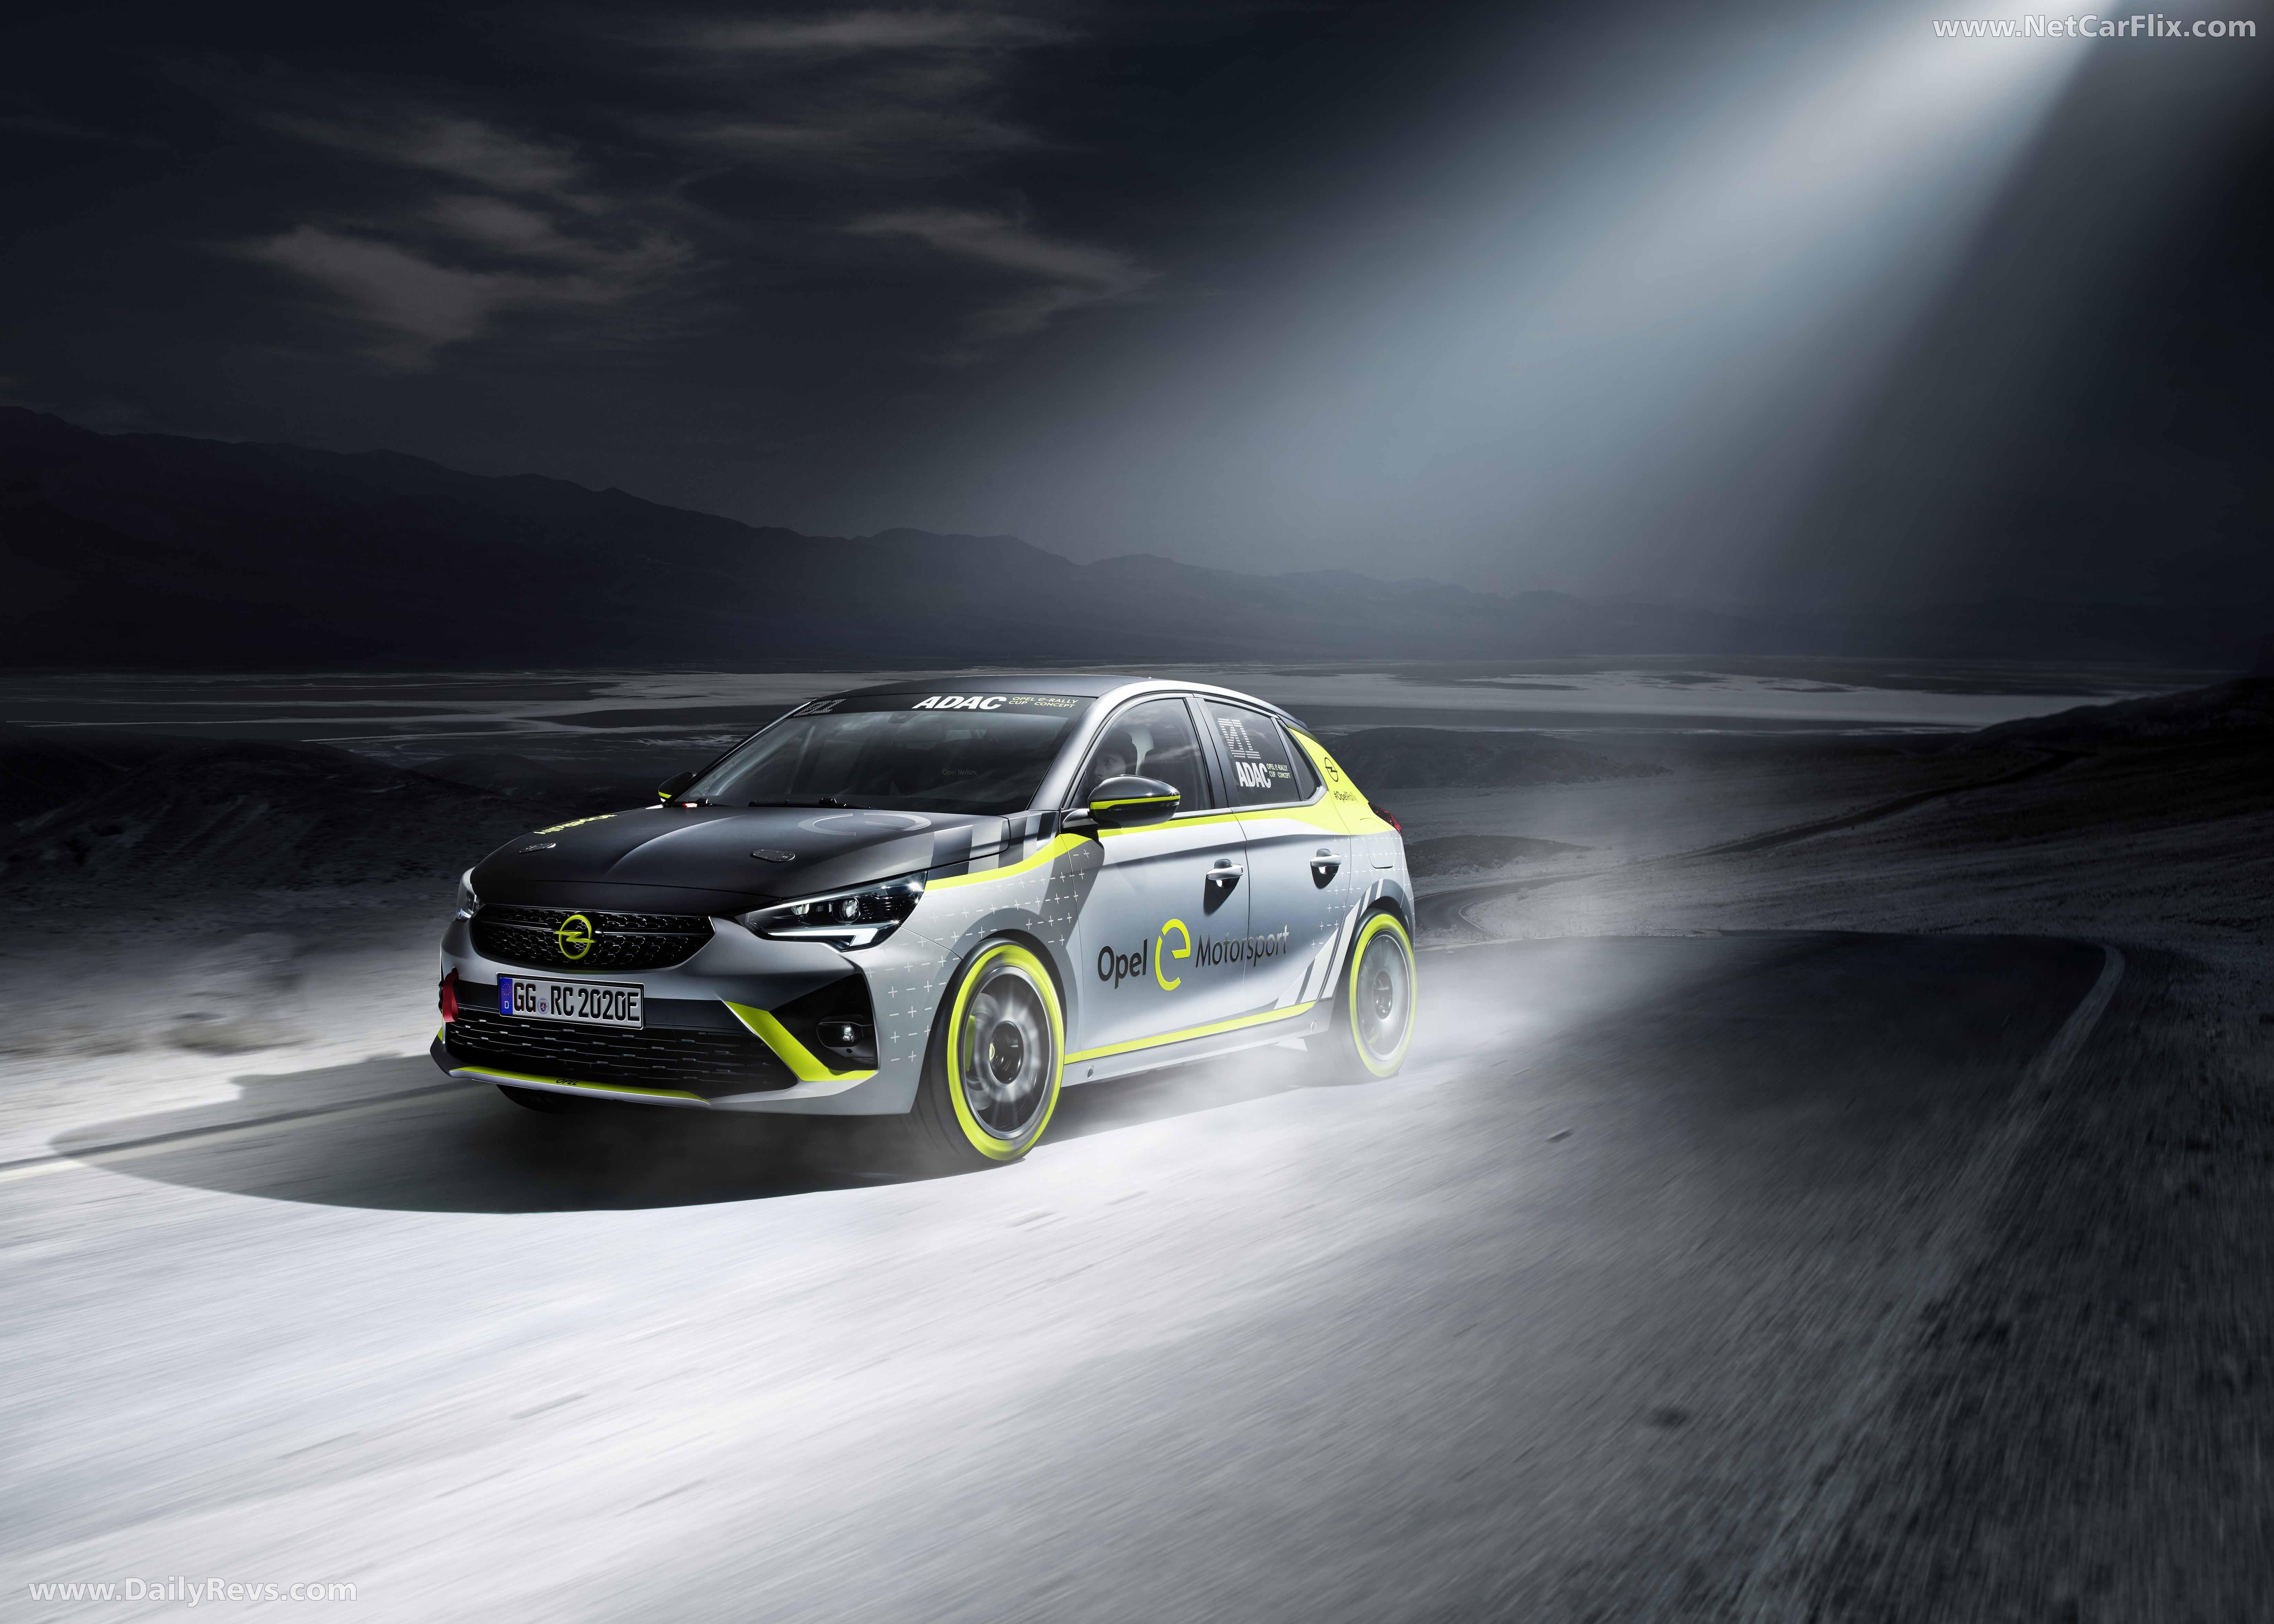 2020 Opel Corsa-e Rally full